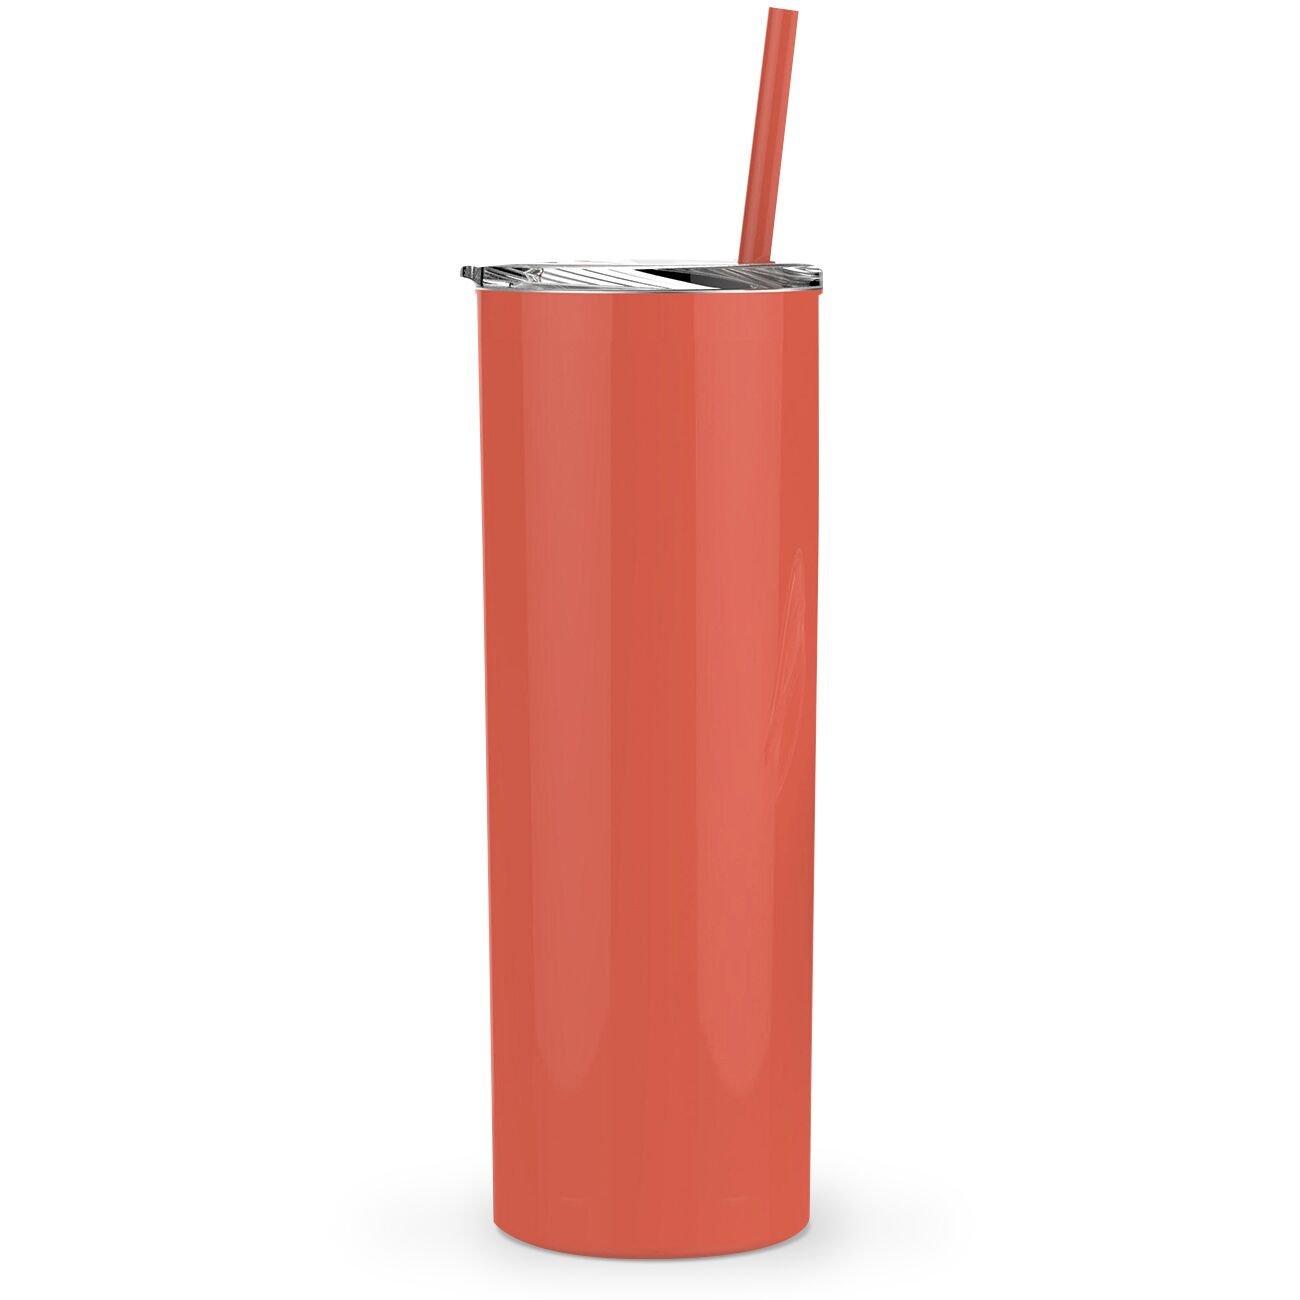 Maars Skinny Steel Stainless Steel Tumbler, 20 oz | Double Wall Vacuum Insulated (Coral)